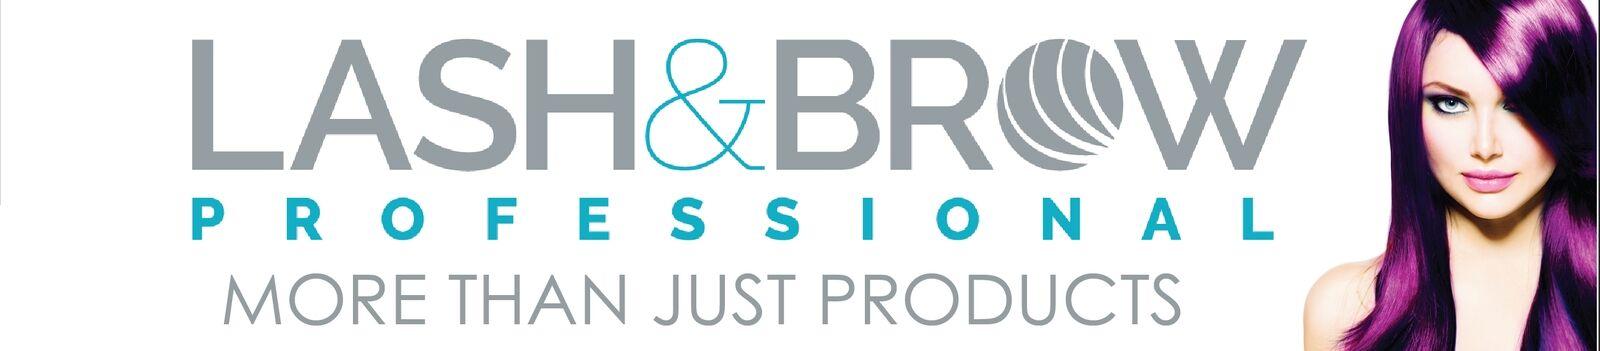 Lash & Brow Professional